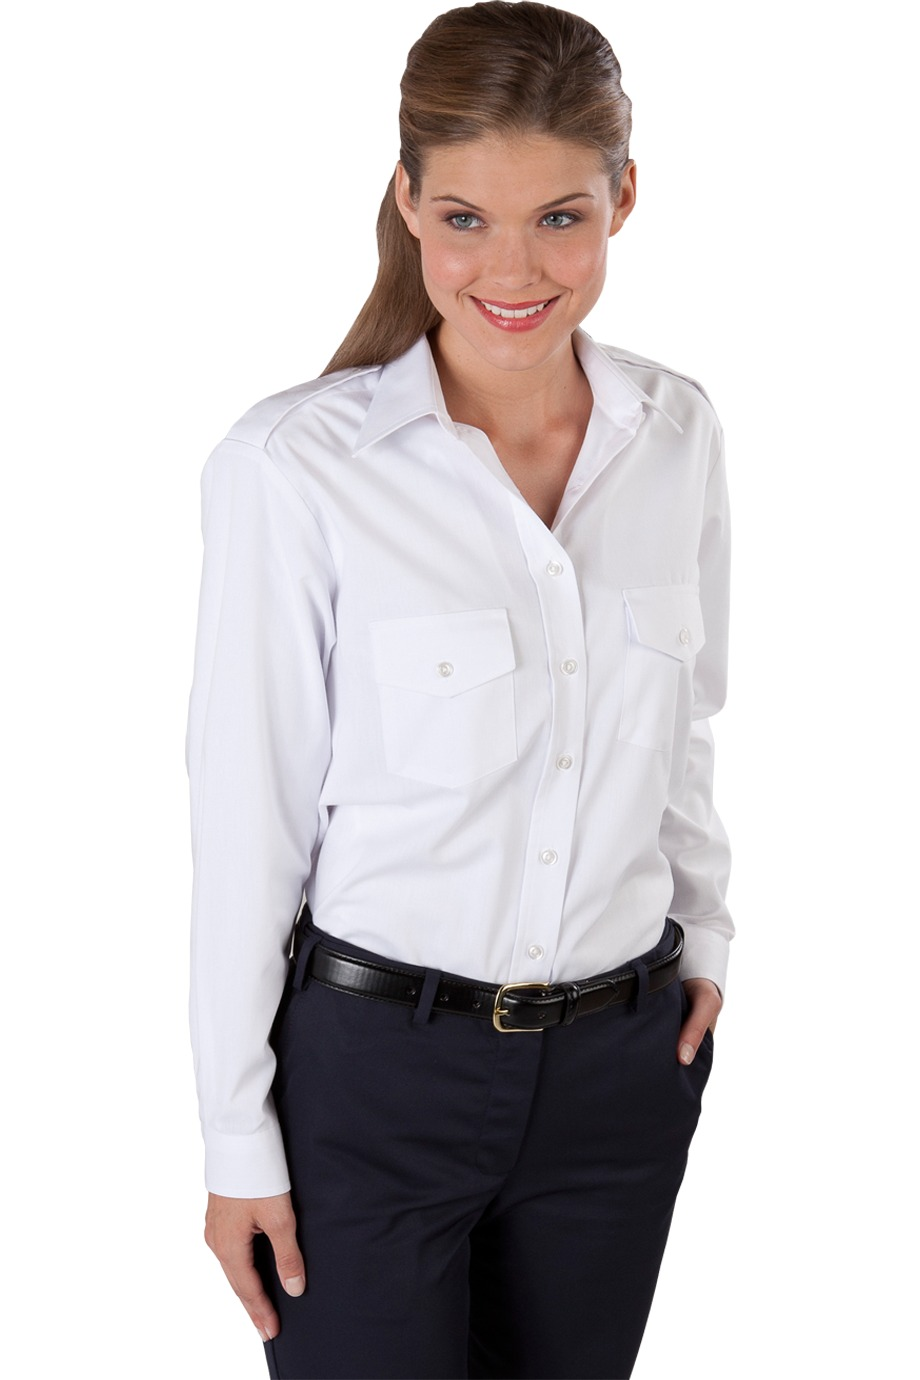 Edwards Garment 5262 - Women's Long Sleeve Navigator ...